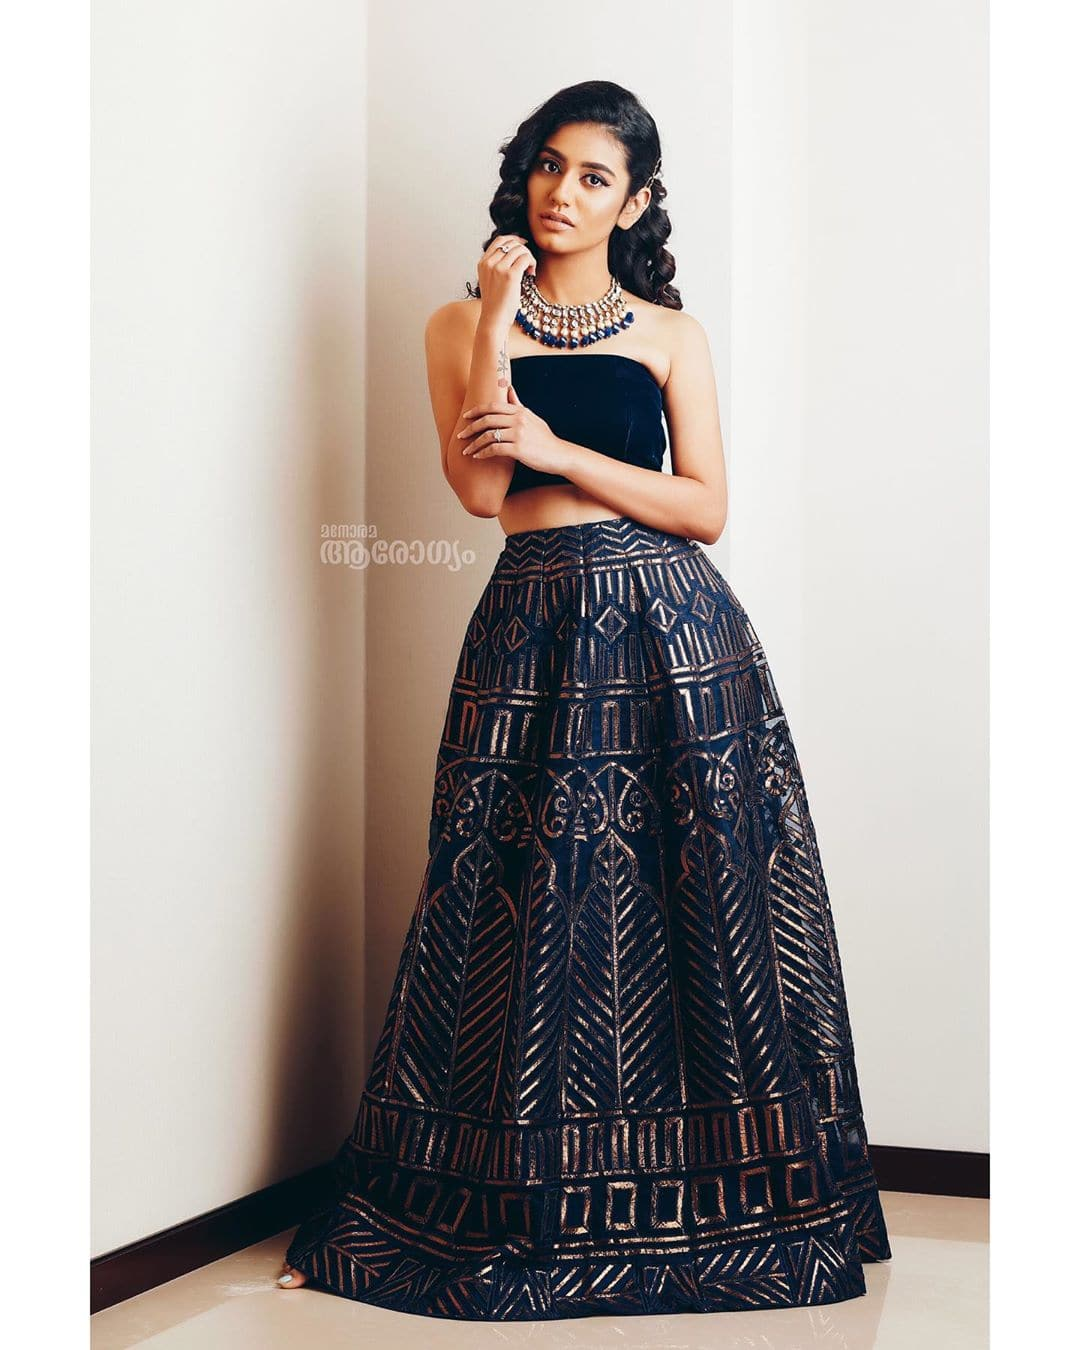 Priya Prakash Varrier Proves to be a True Style Icon